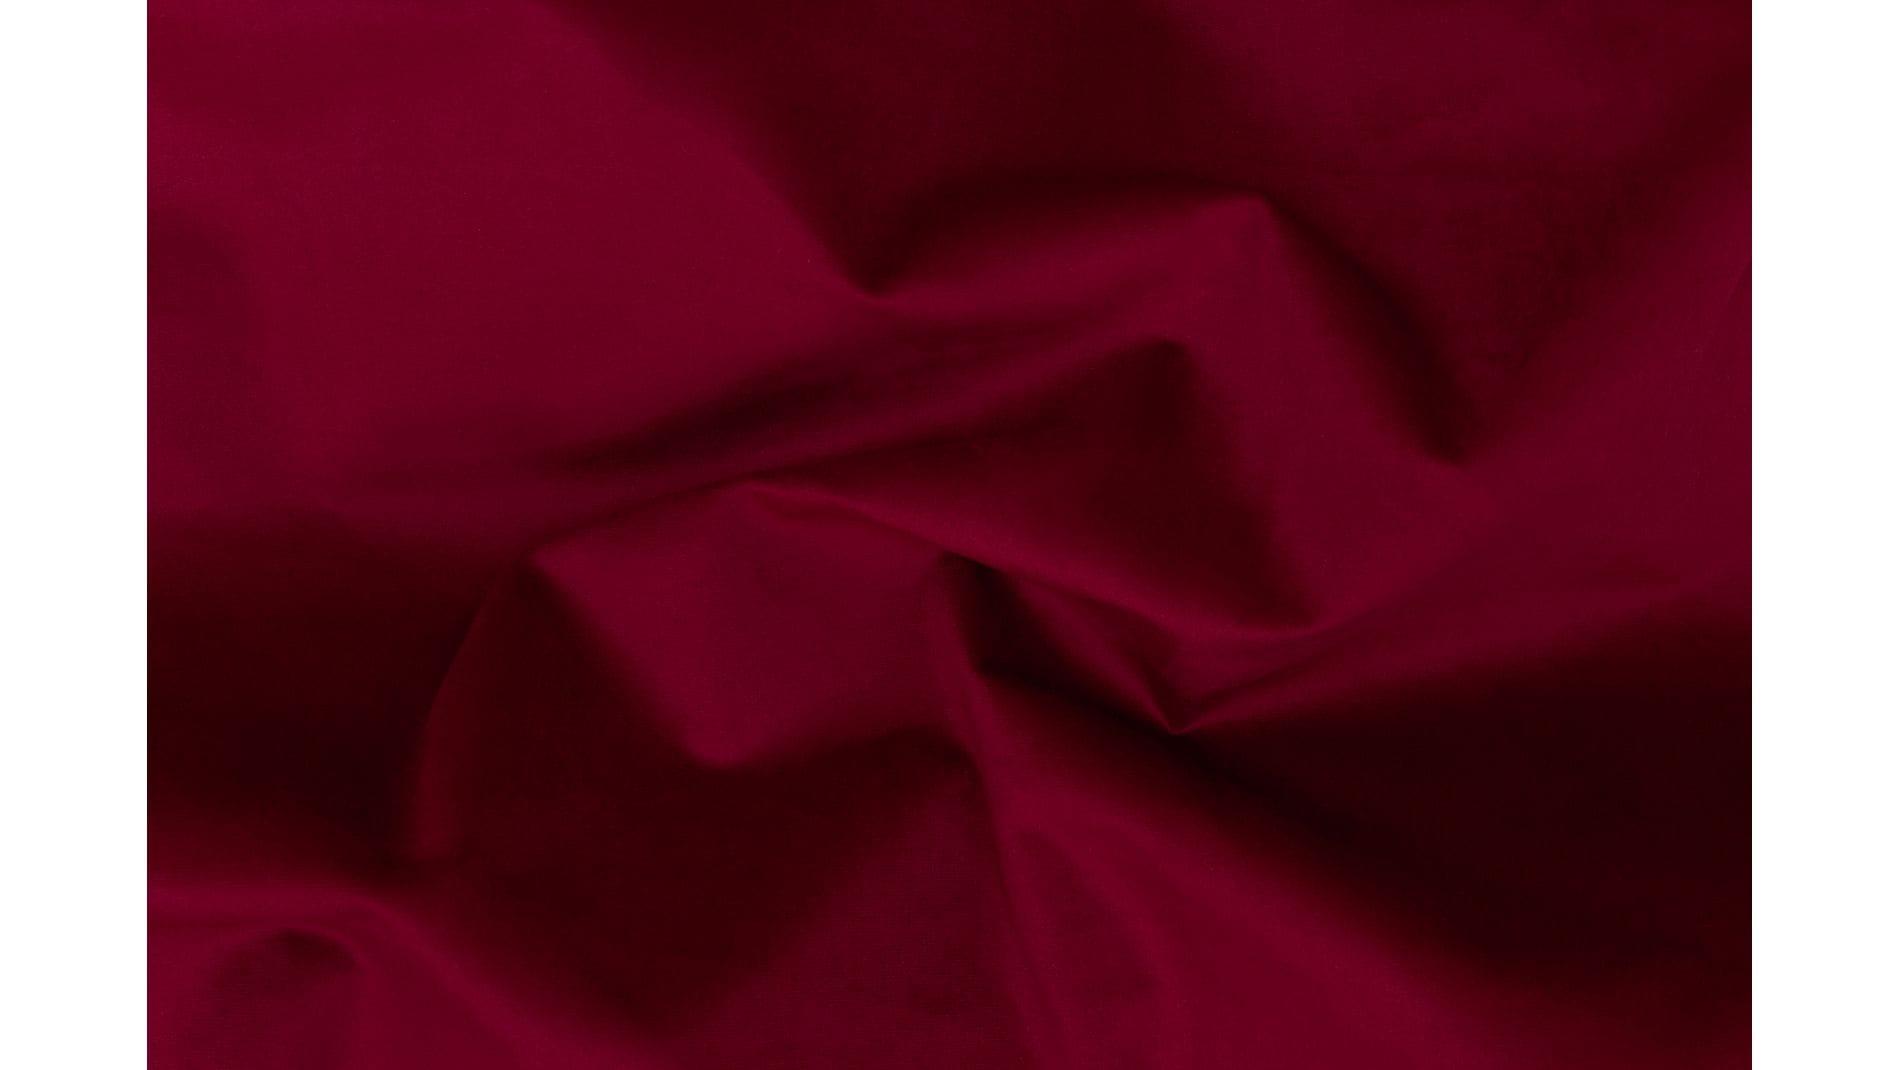 Диван Честерфилд (Chesterfield) большой Тёмно-бордовый МР